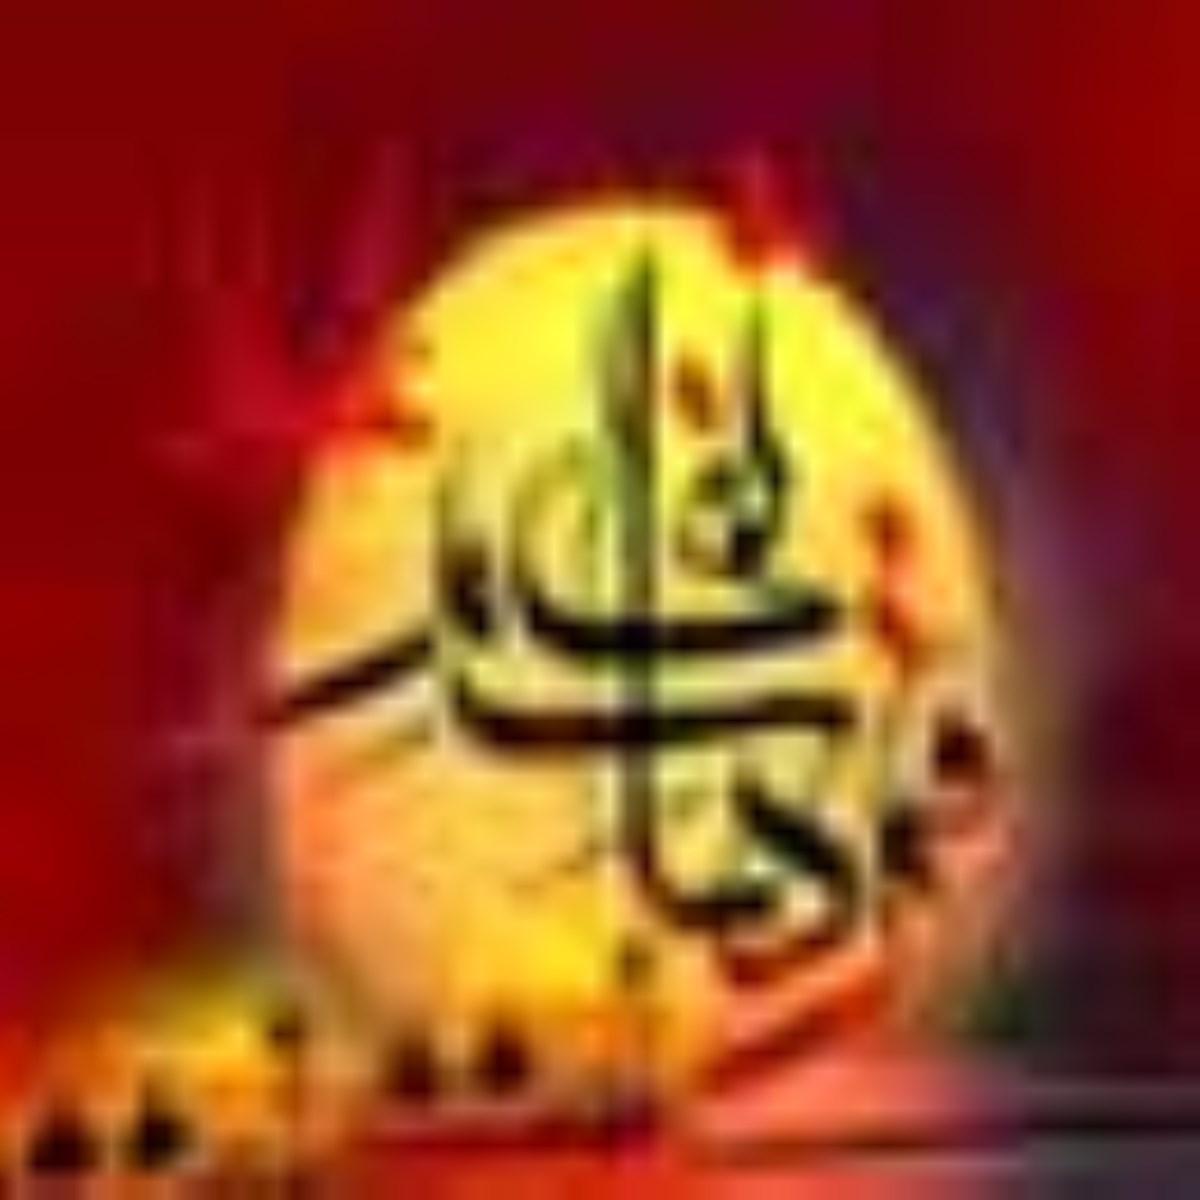 ویژگیهاى روحى حضرت عباس علیهالسلام